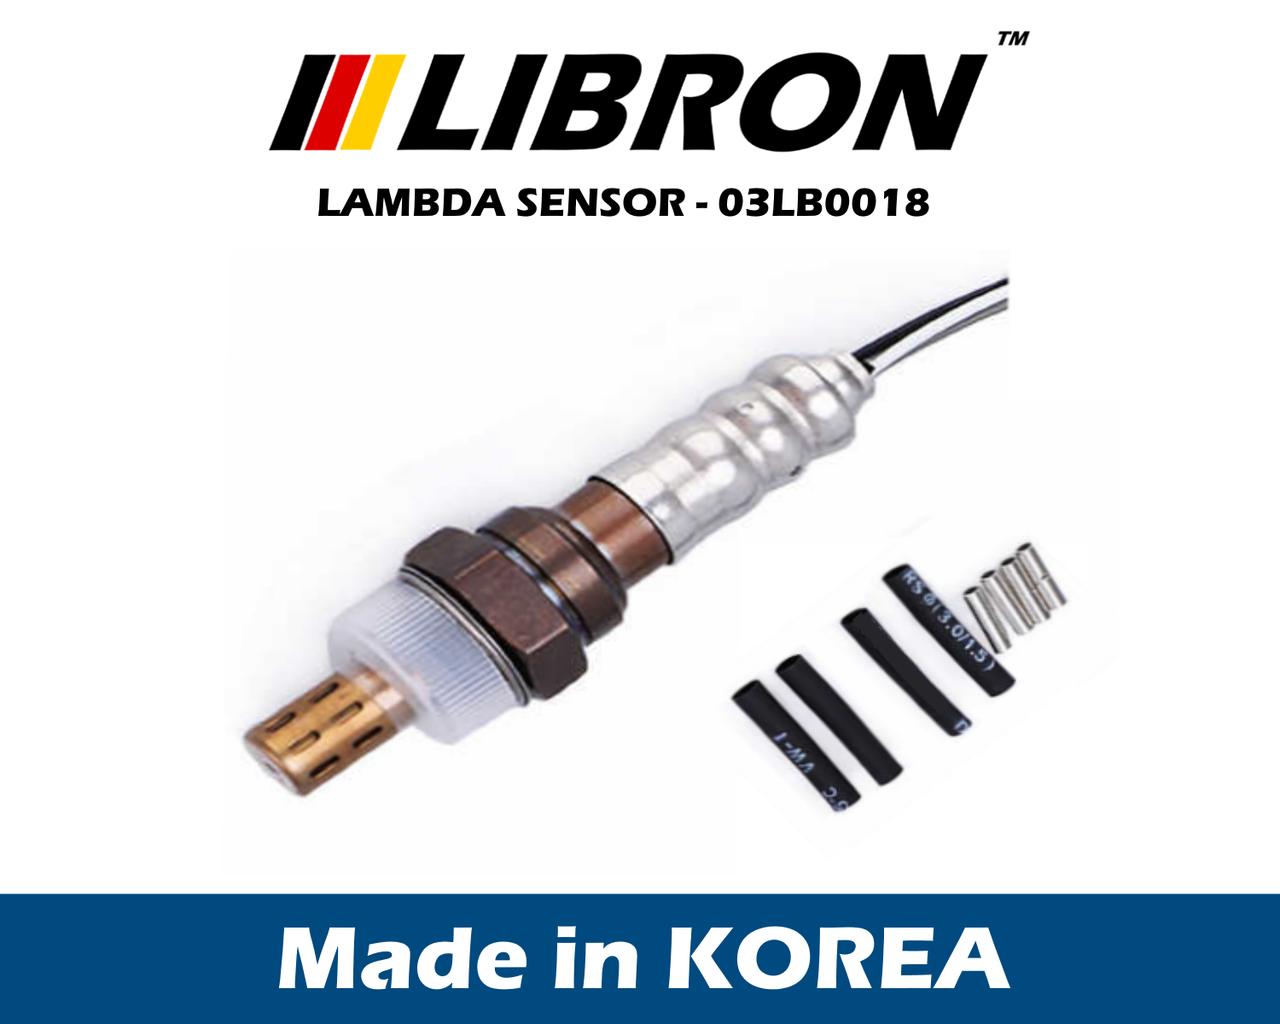 Лямбда зонд Libron 03LB0018 - Peugeot 206 SW (2E/K)